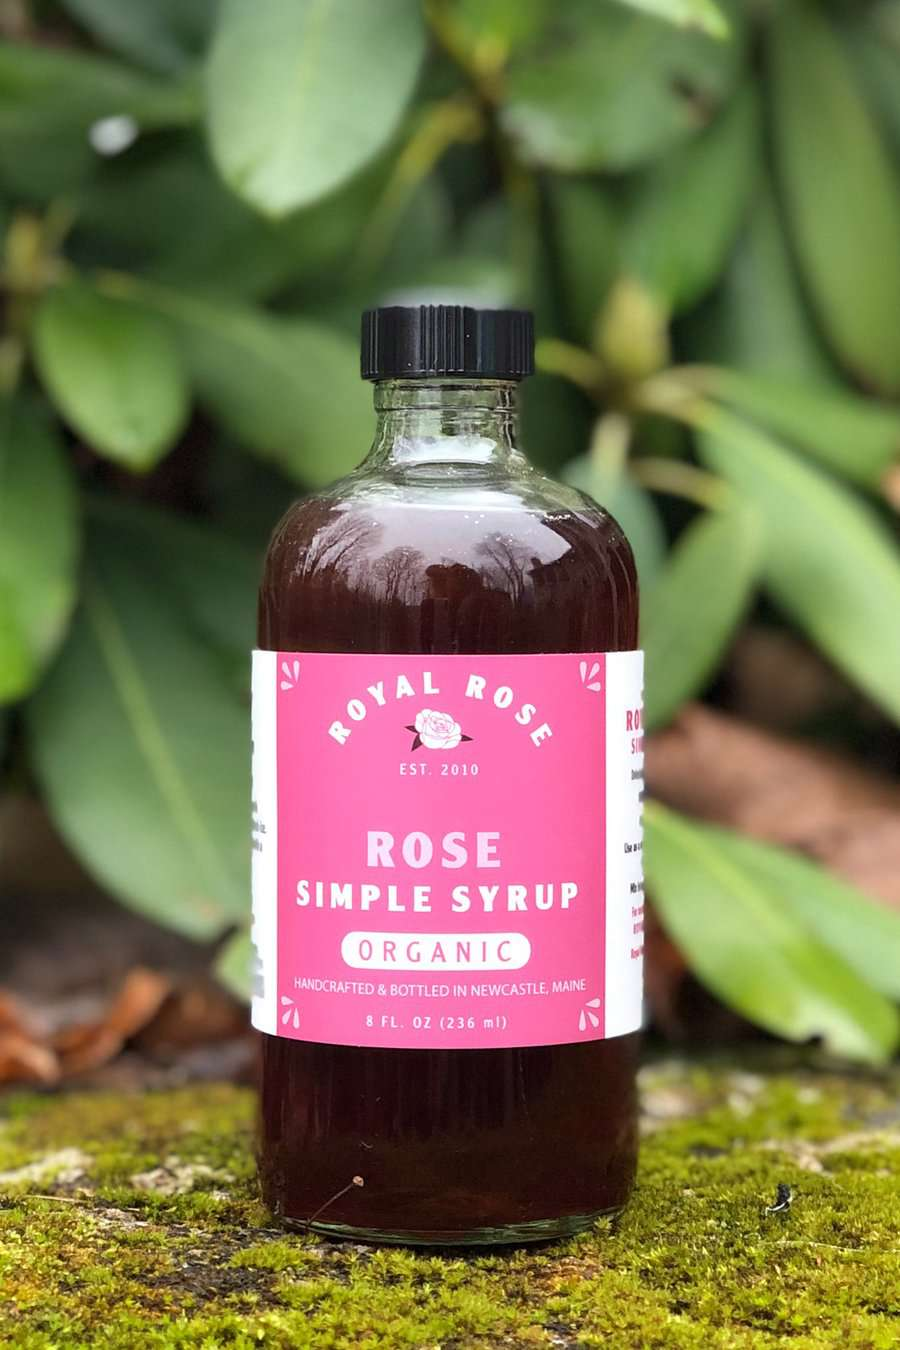 Rose Organic Simple Syrup